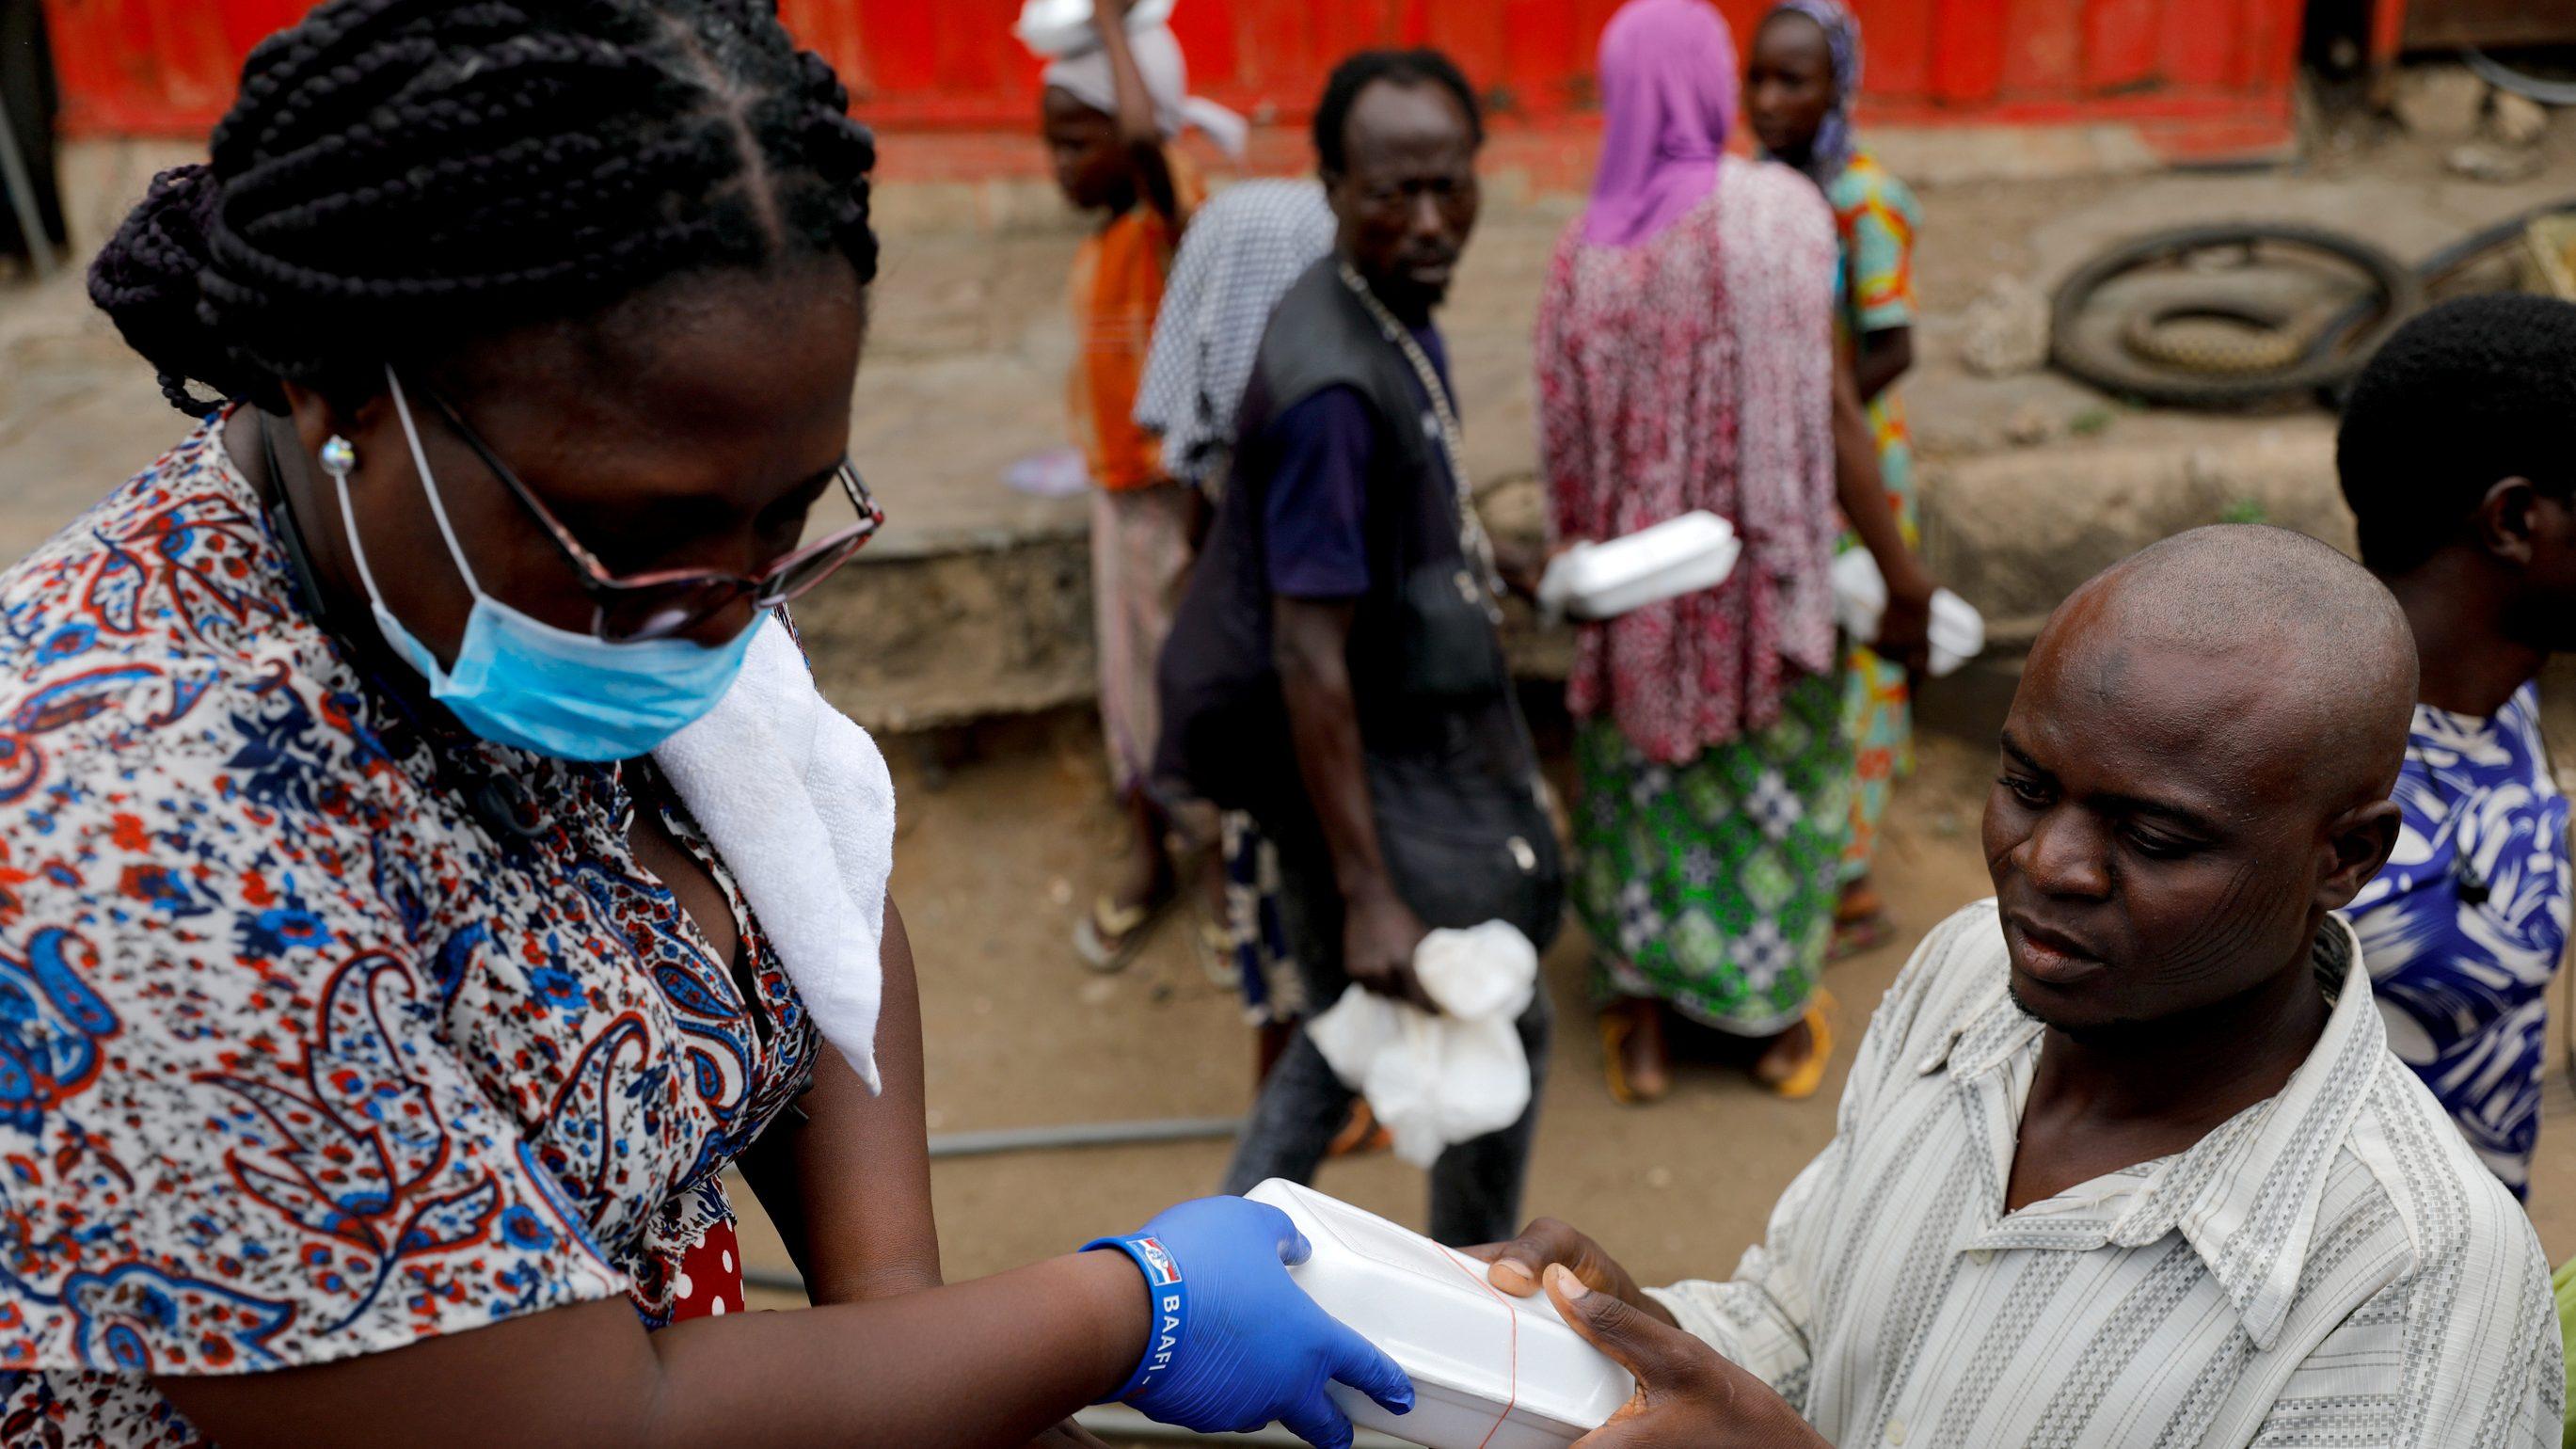 Ghana lifts coronavirus lockdown as testing ramps up — Quartz Africa